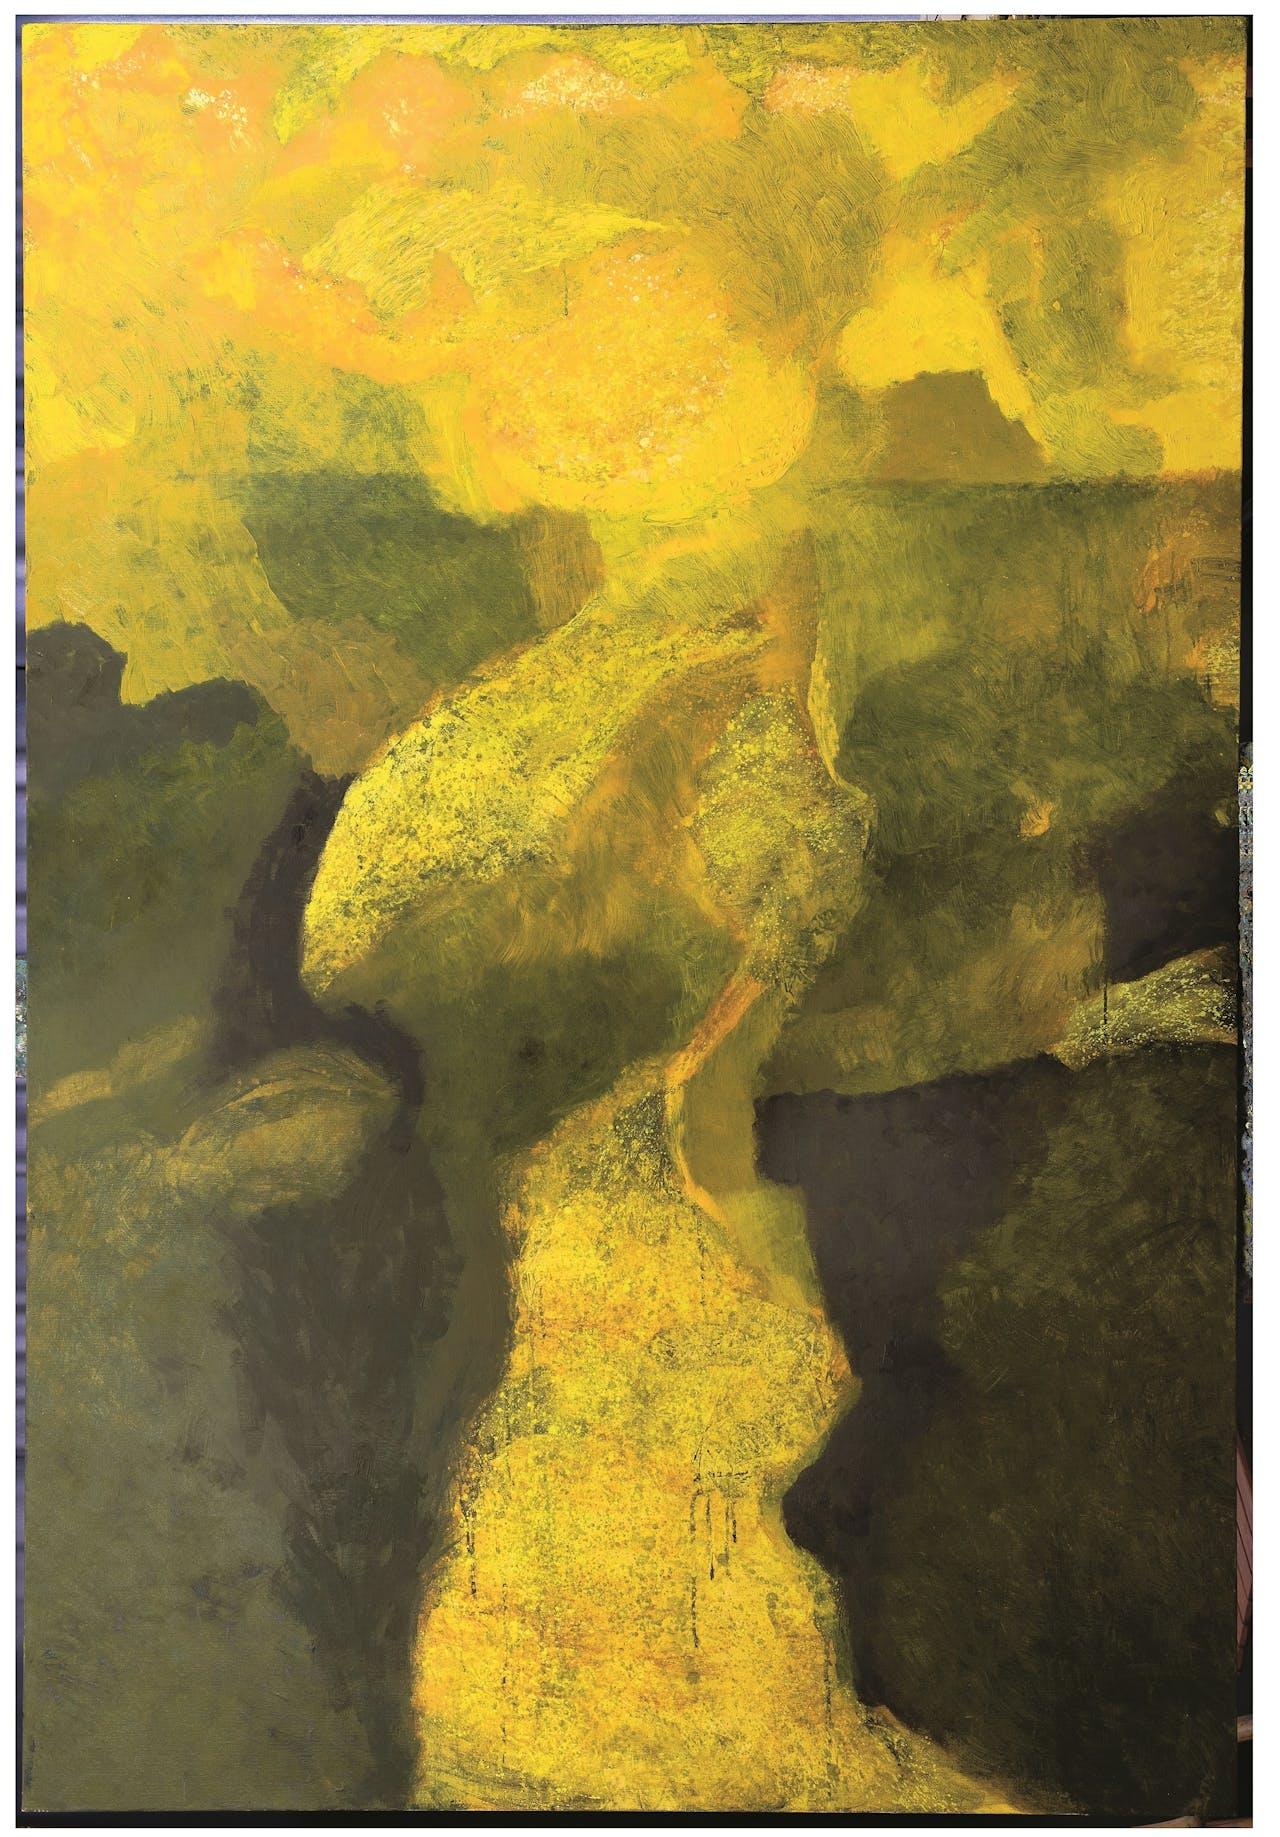 Opkomende zon, Jeroen Krabbé, 2015.